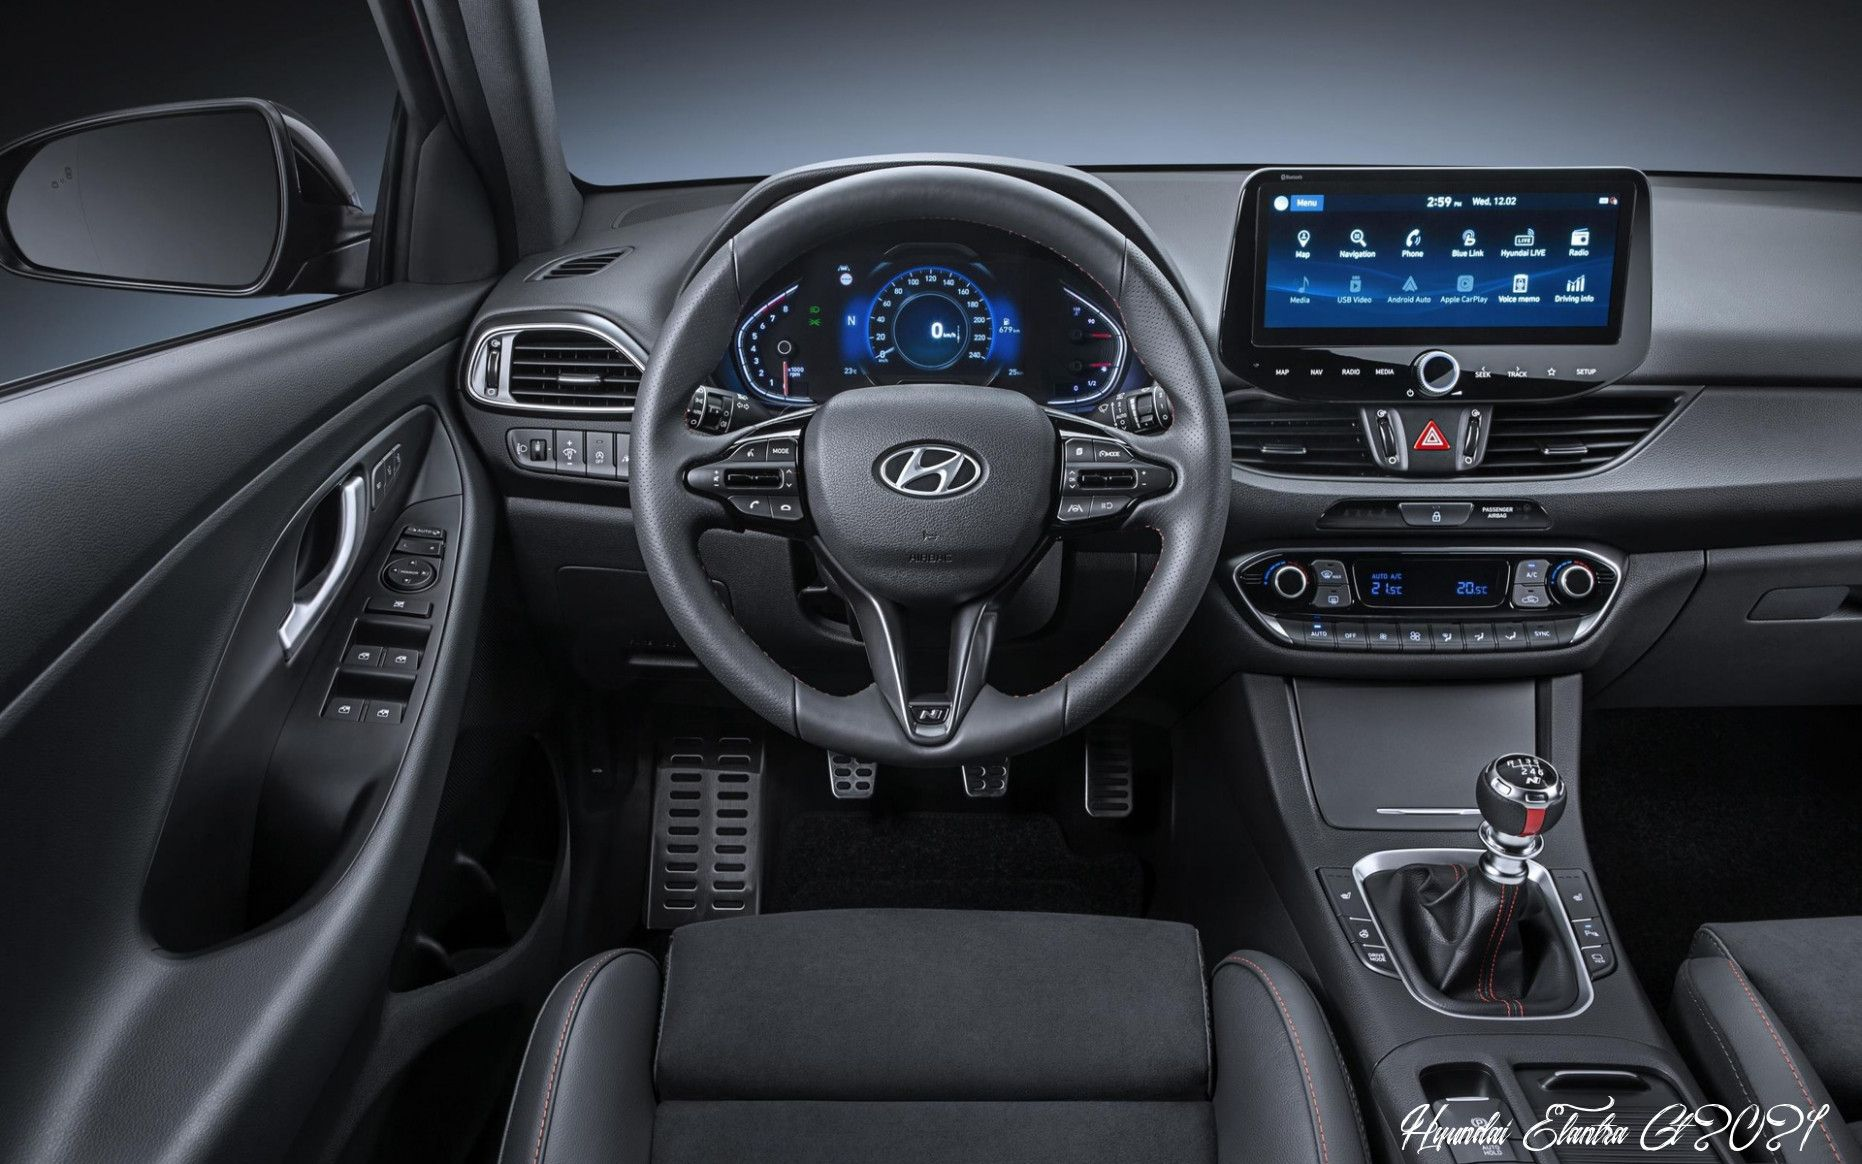 Hyundai Elantra Gt 2021 Redesign In 2020 Hyundai Hyundai Elantra Hyundai Small Cars